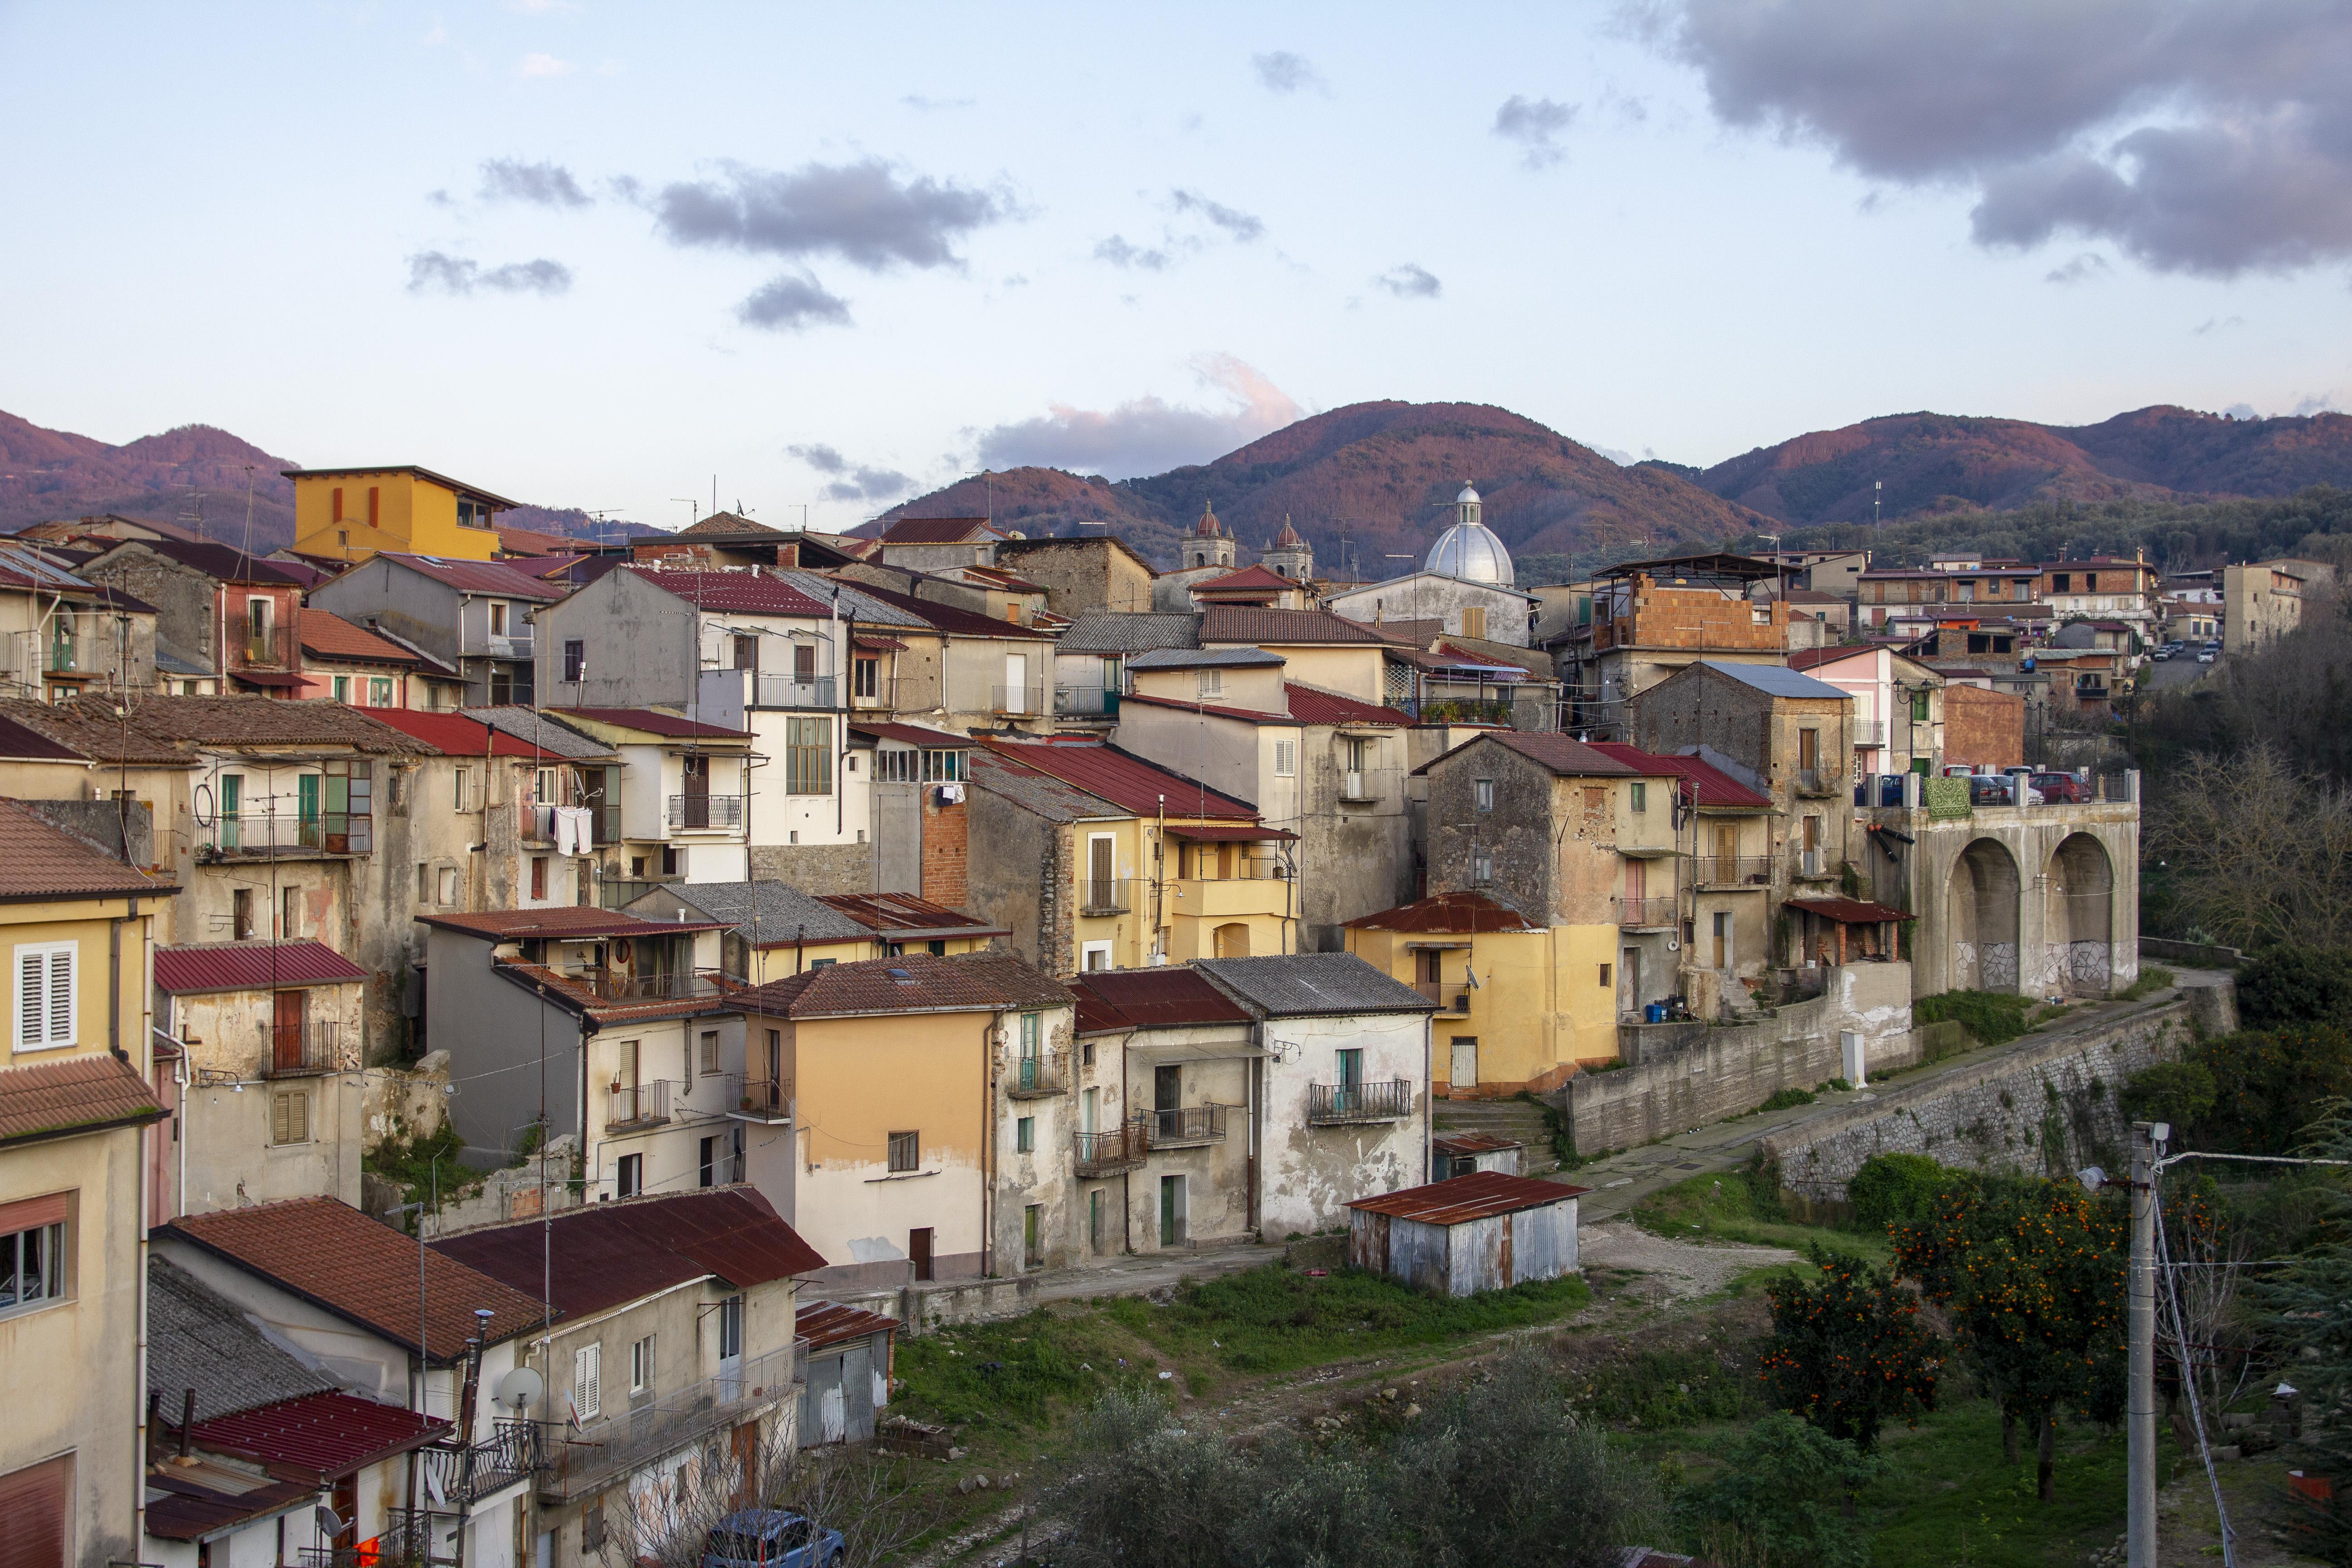 Comune di Cinquefrondi - Parte vecchia panoramica / Fotografie di Tullio Pronestì